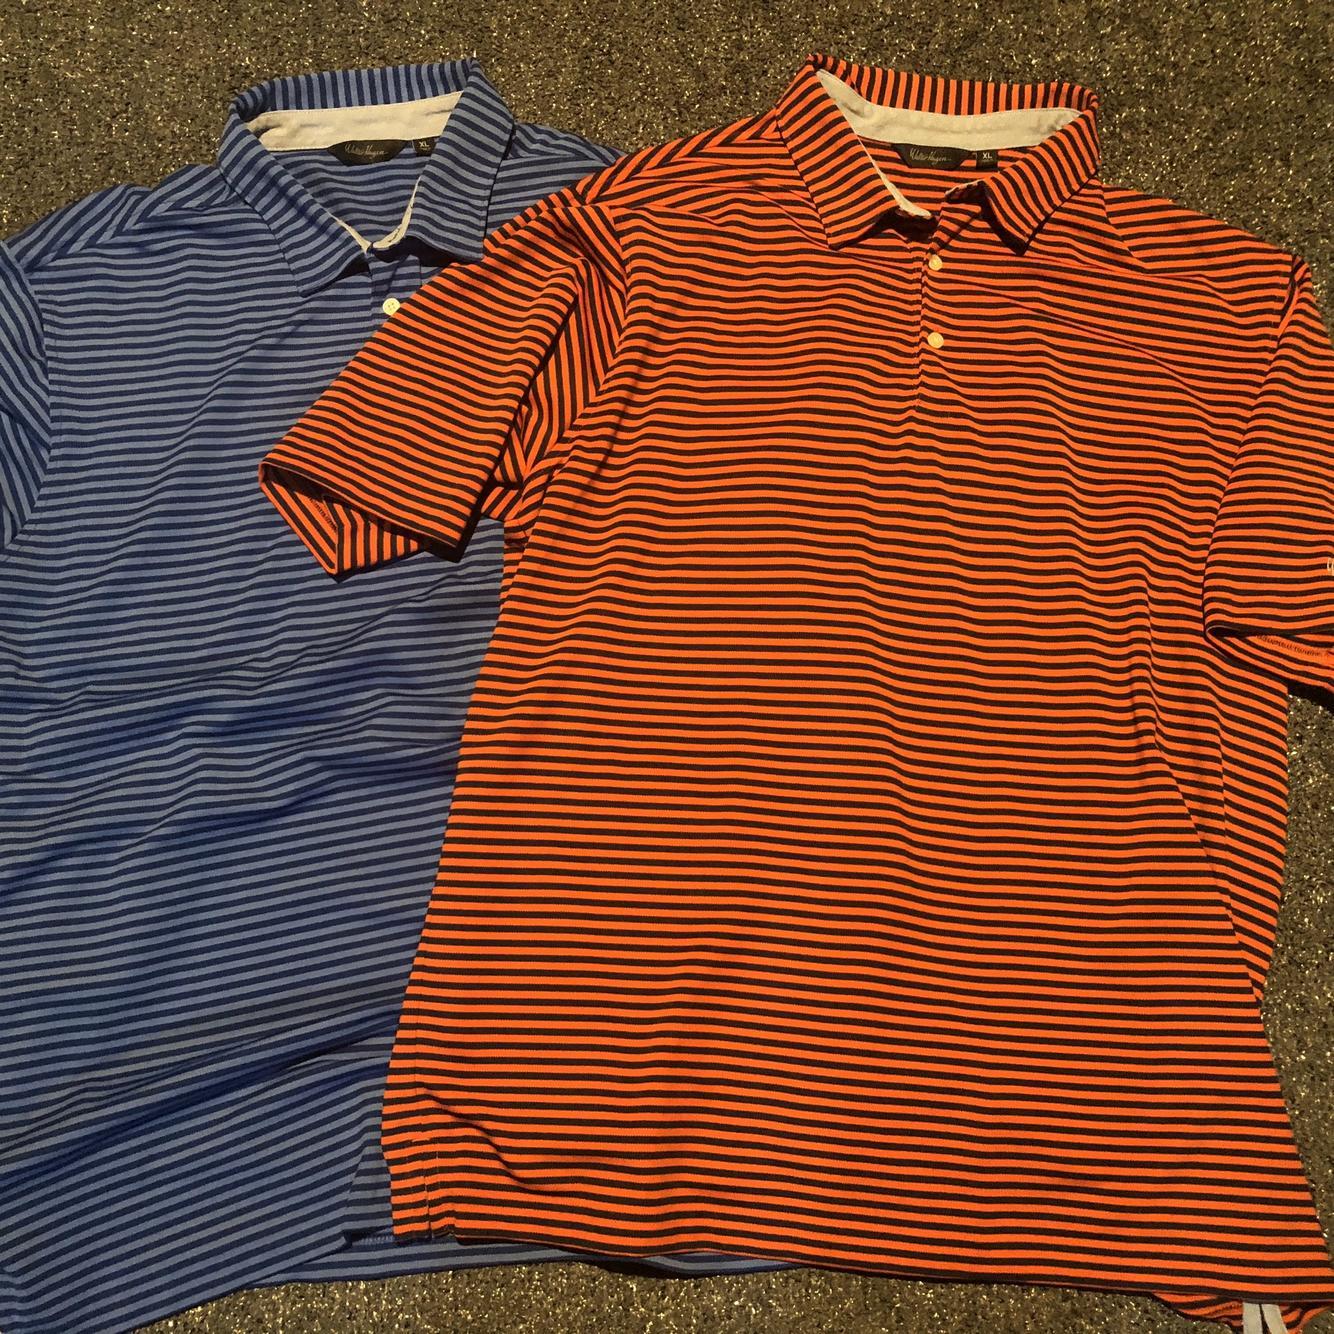 LOT 2 Walter Hagen Striped Blue Orange Men's XL Golf Polo Shirt ...